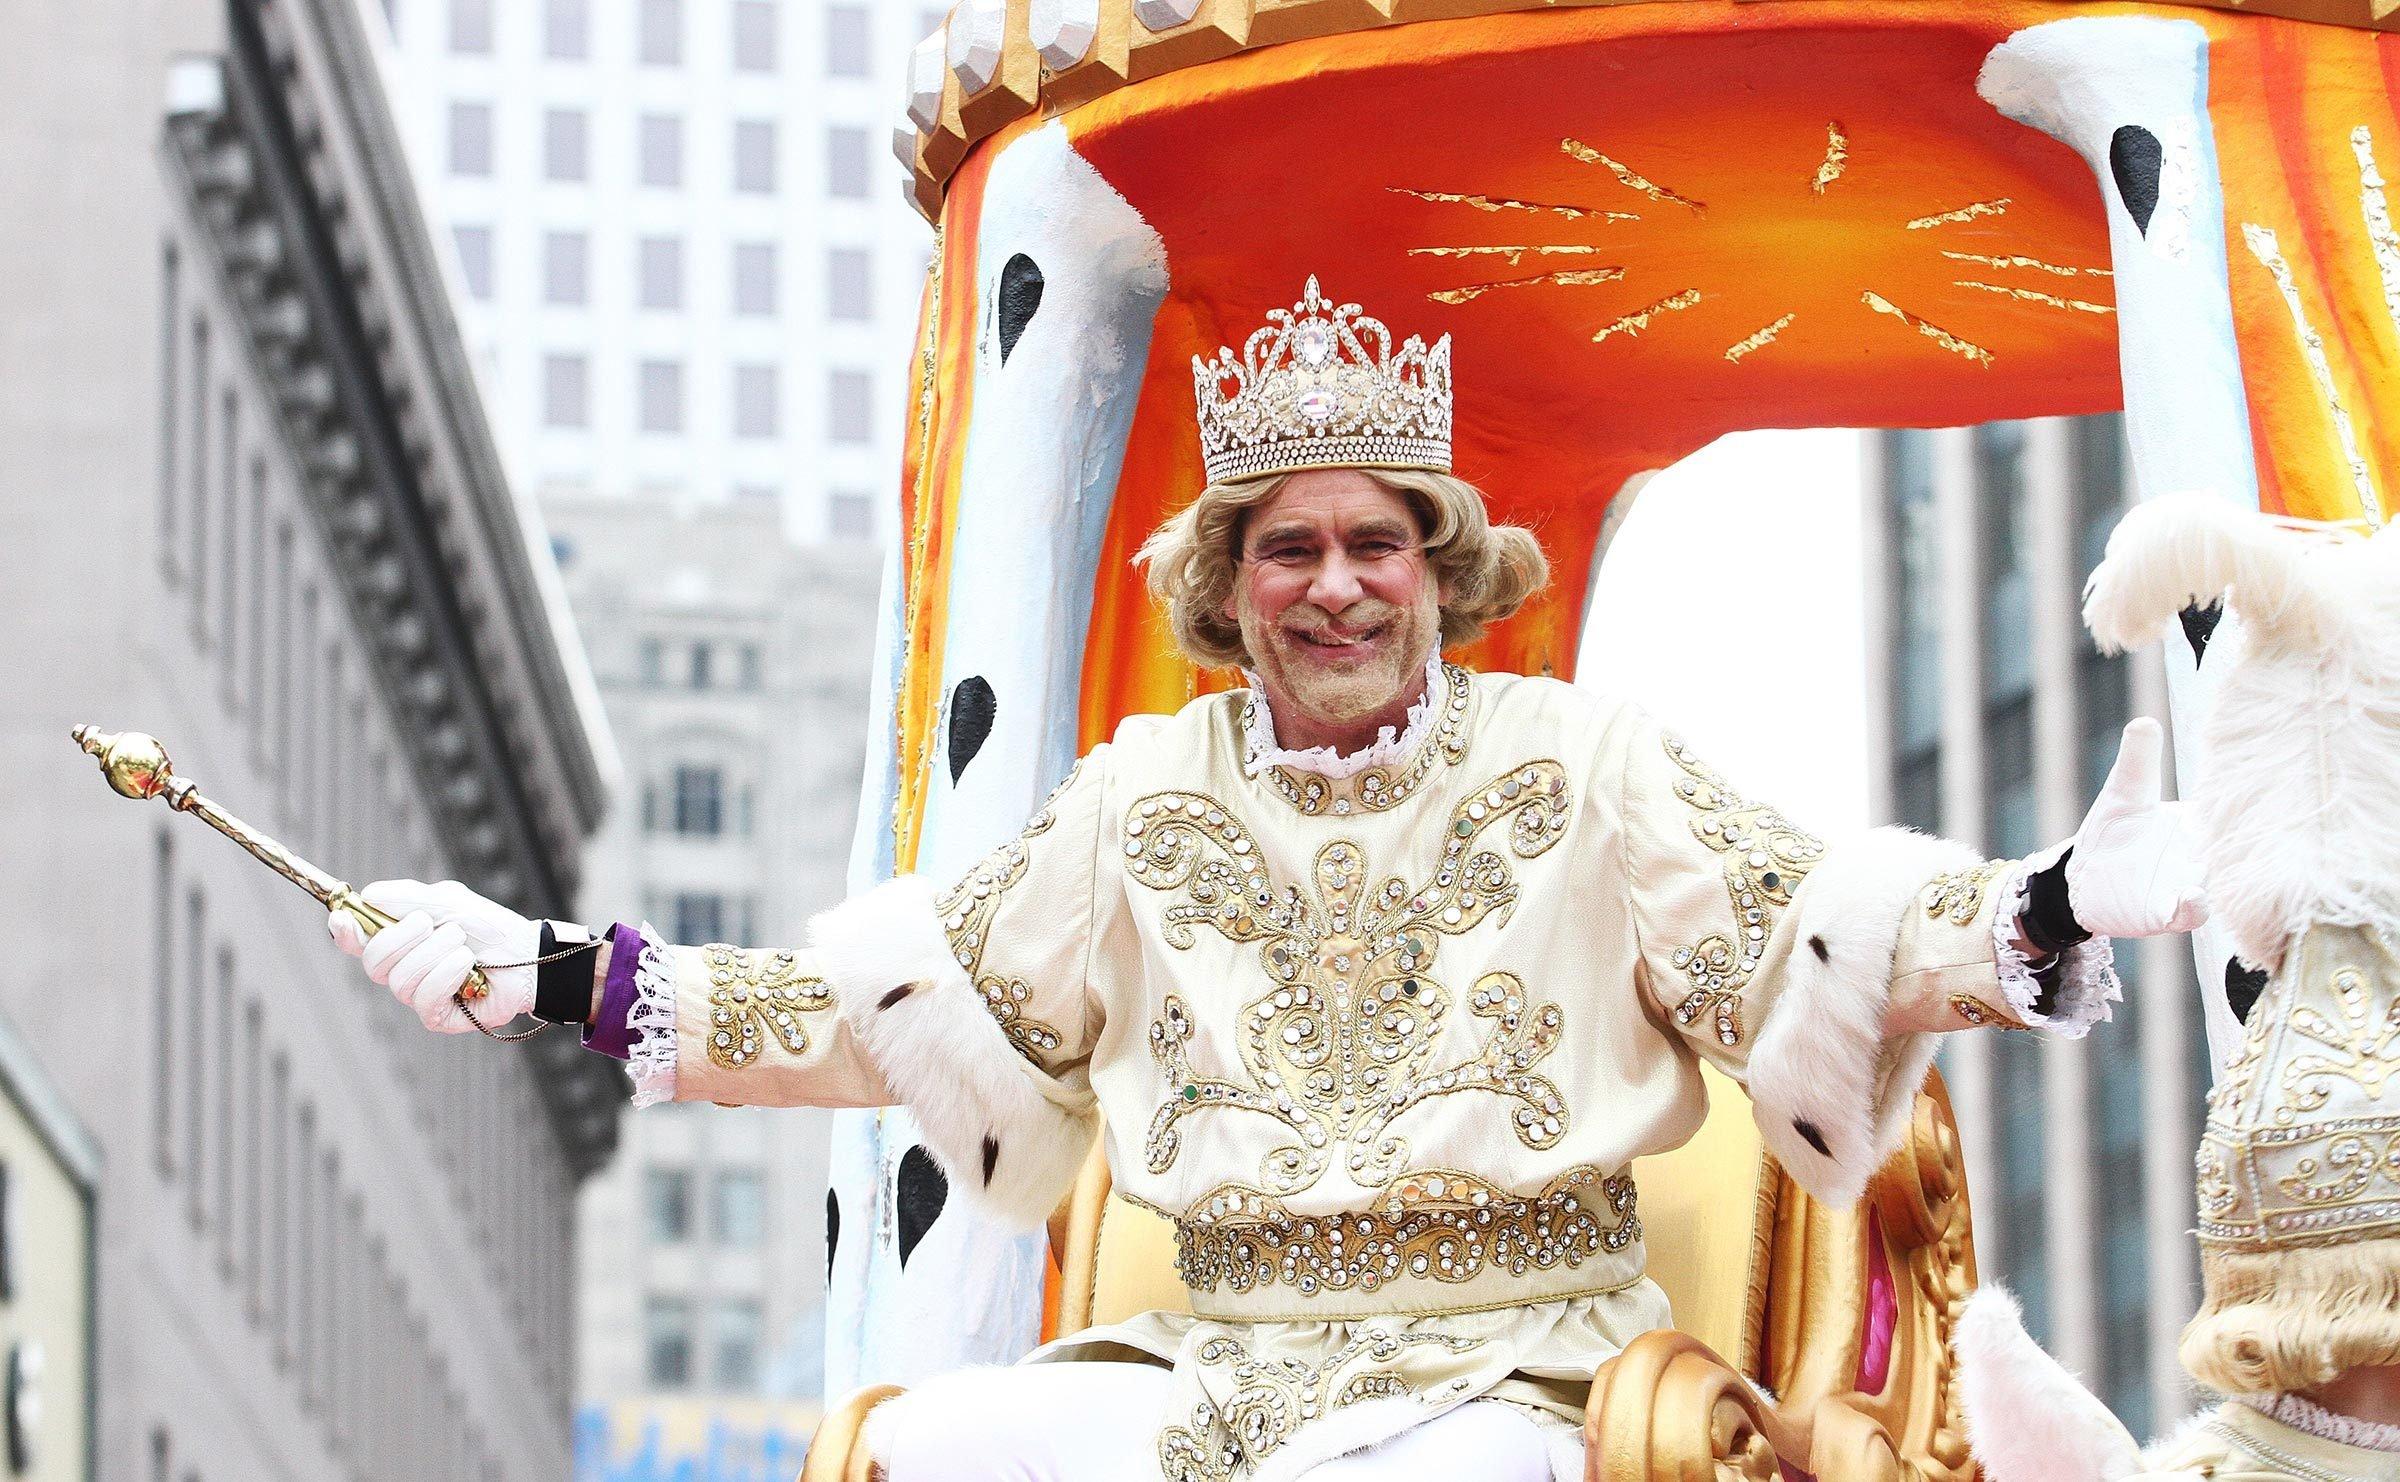 Usa New Orleans Mardi Gras - Feb 2015